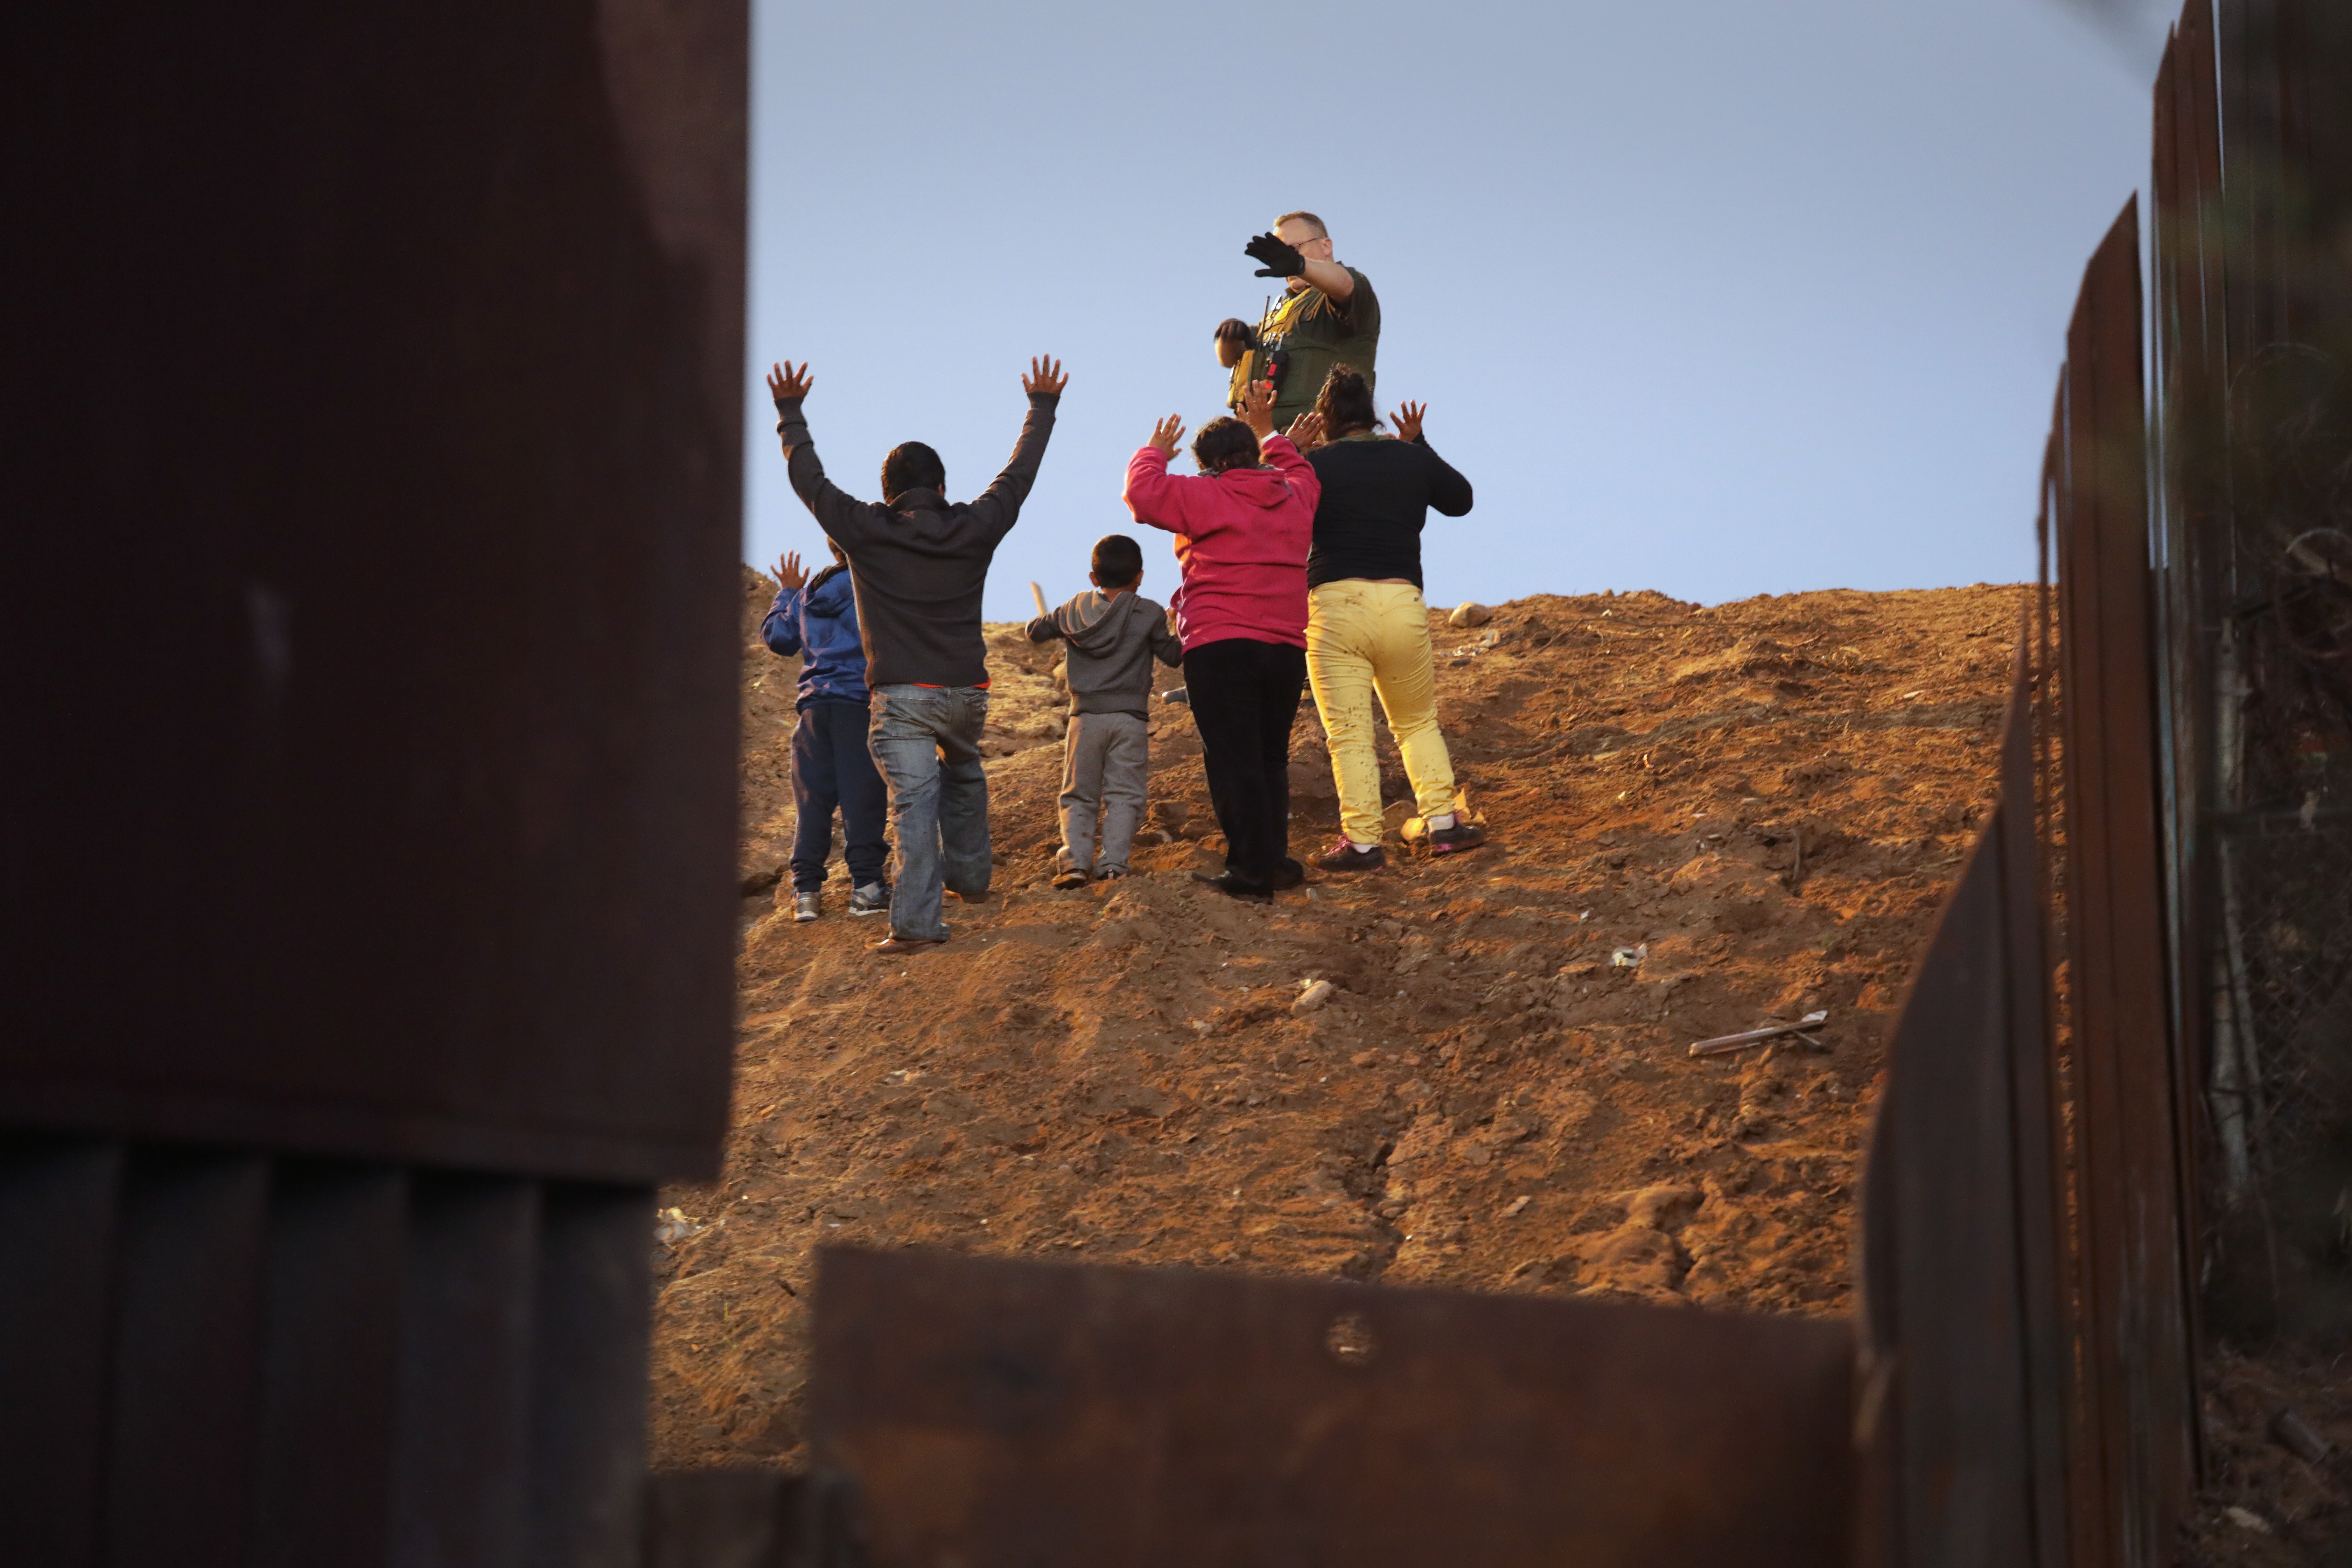 Migrant girl dies in Border Patrol's custody